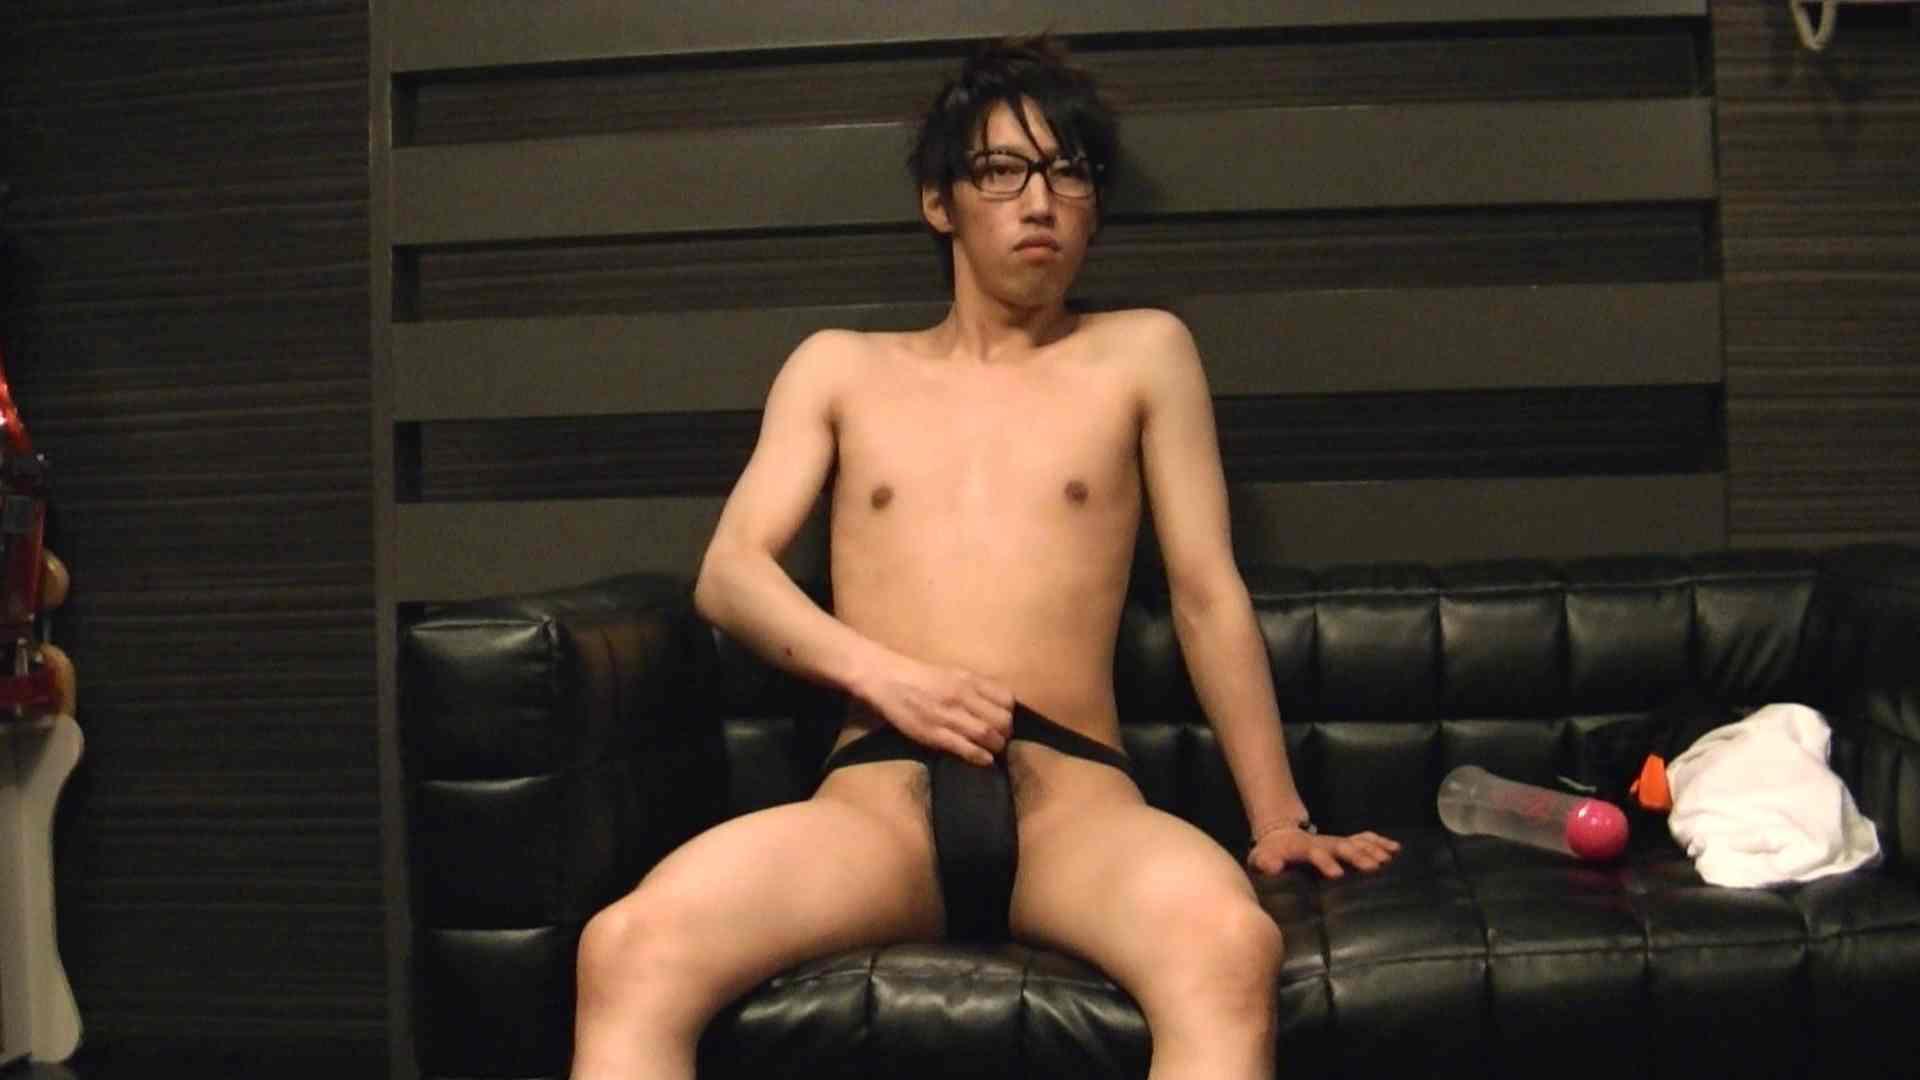 Mr.オナックスさん投稿!HD 貴方のオナニー三万円で撮影させてください。VOL.04 投稿 ゲイ無修正ビデオ画像 12画像 5